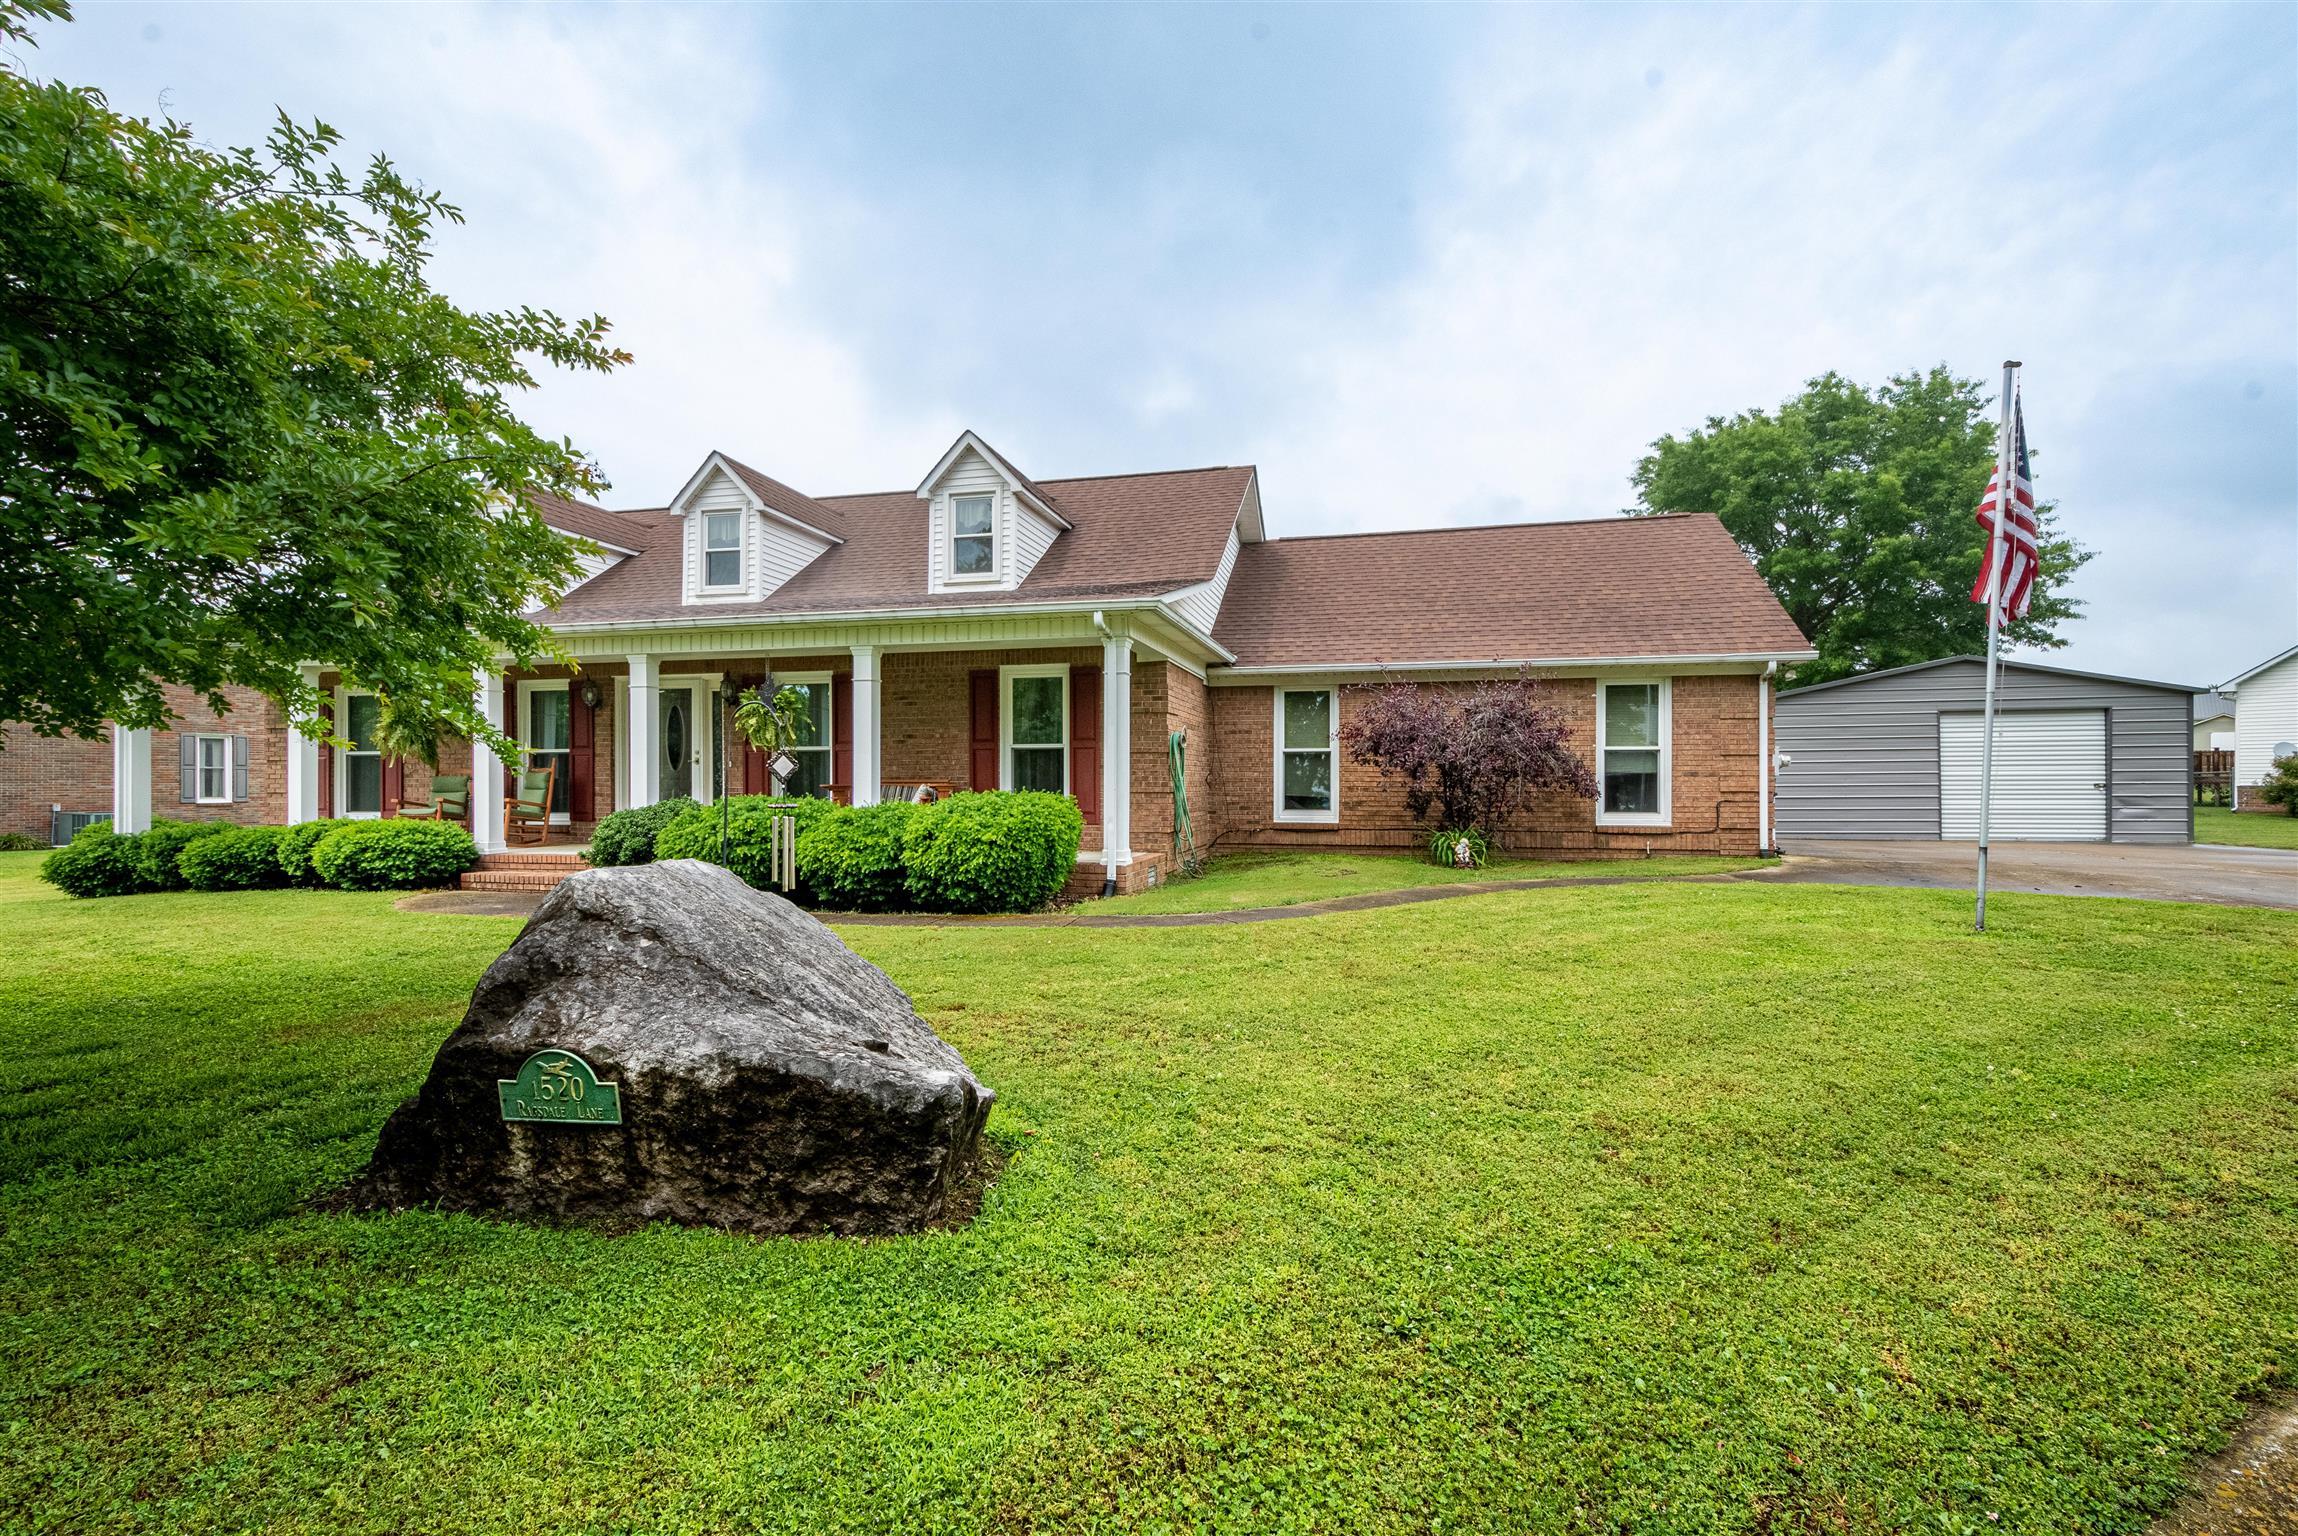 1520 Ragsdale Ln, Pulaski, TN 38478 - Pulaski, TN real estate listing